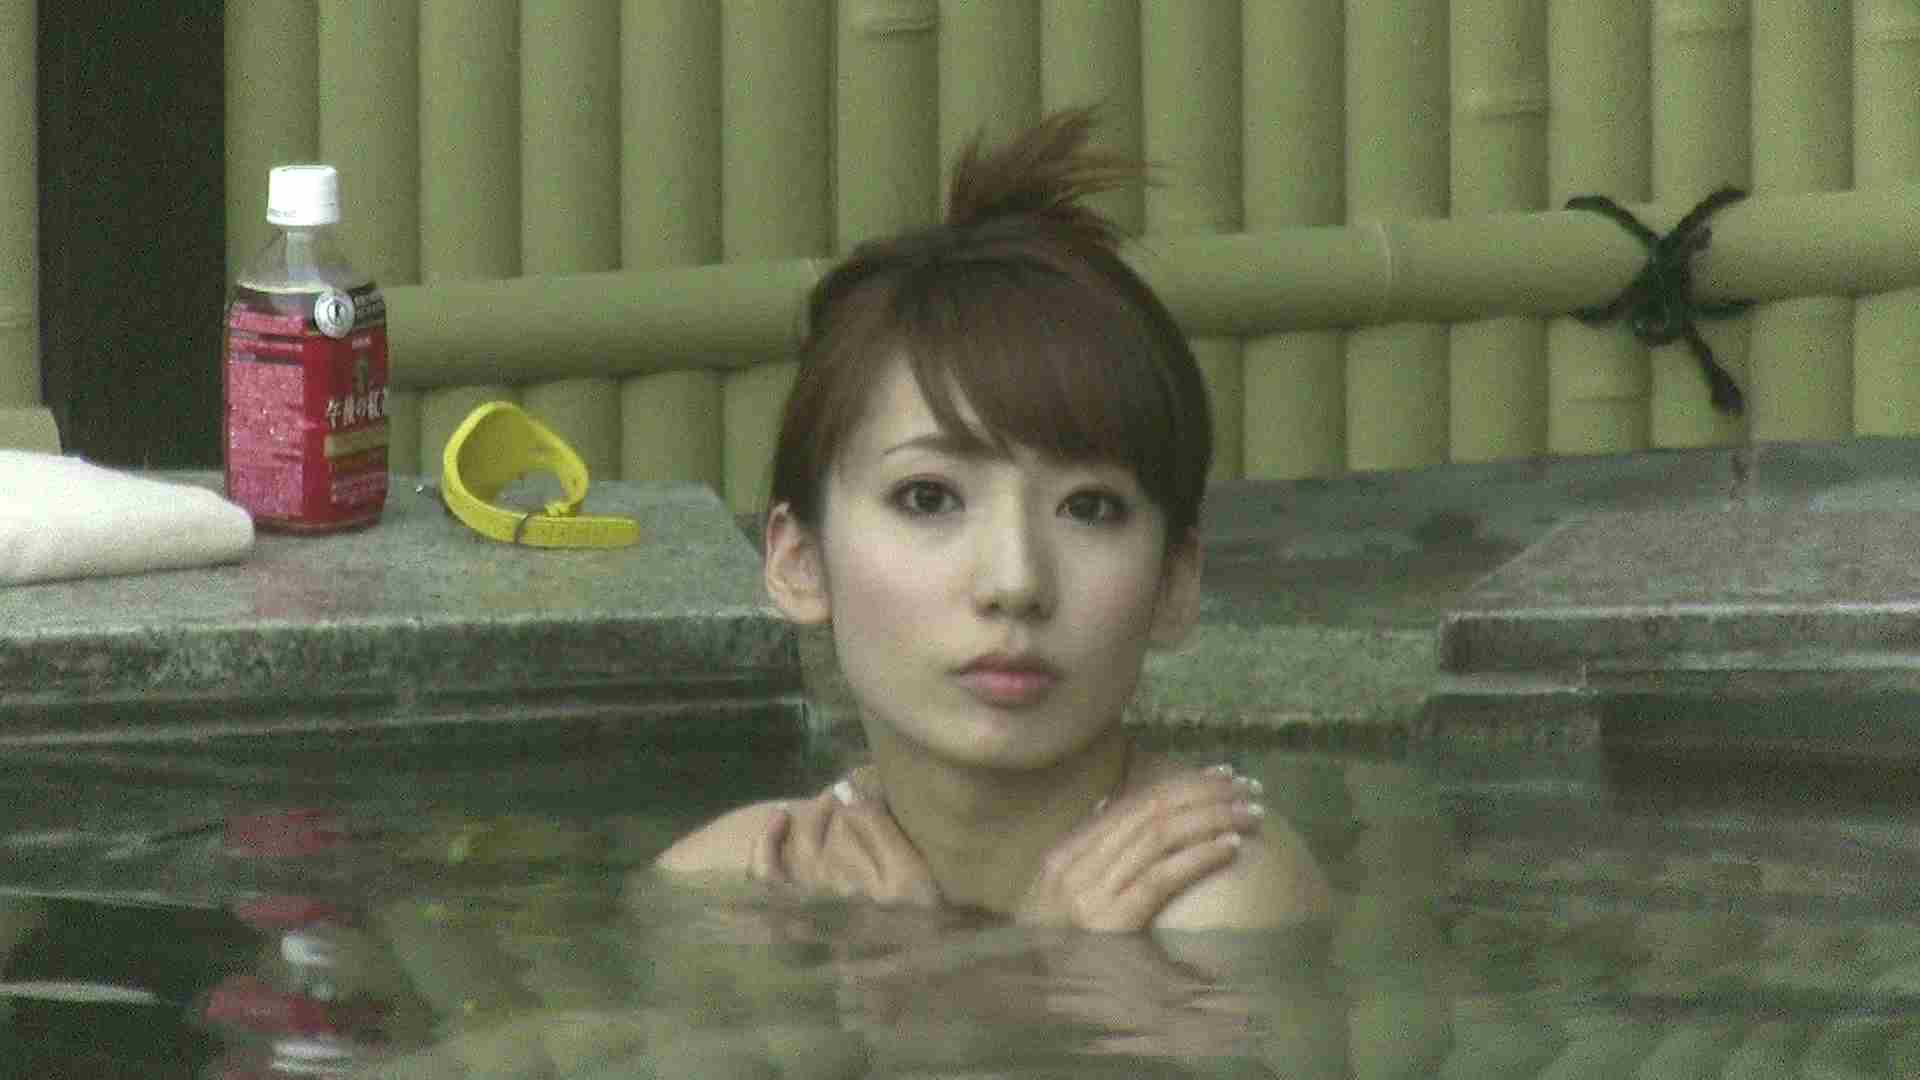 Aquaな露天風呂Vol.208 露天風呂編  103PIX 6